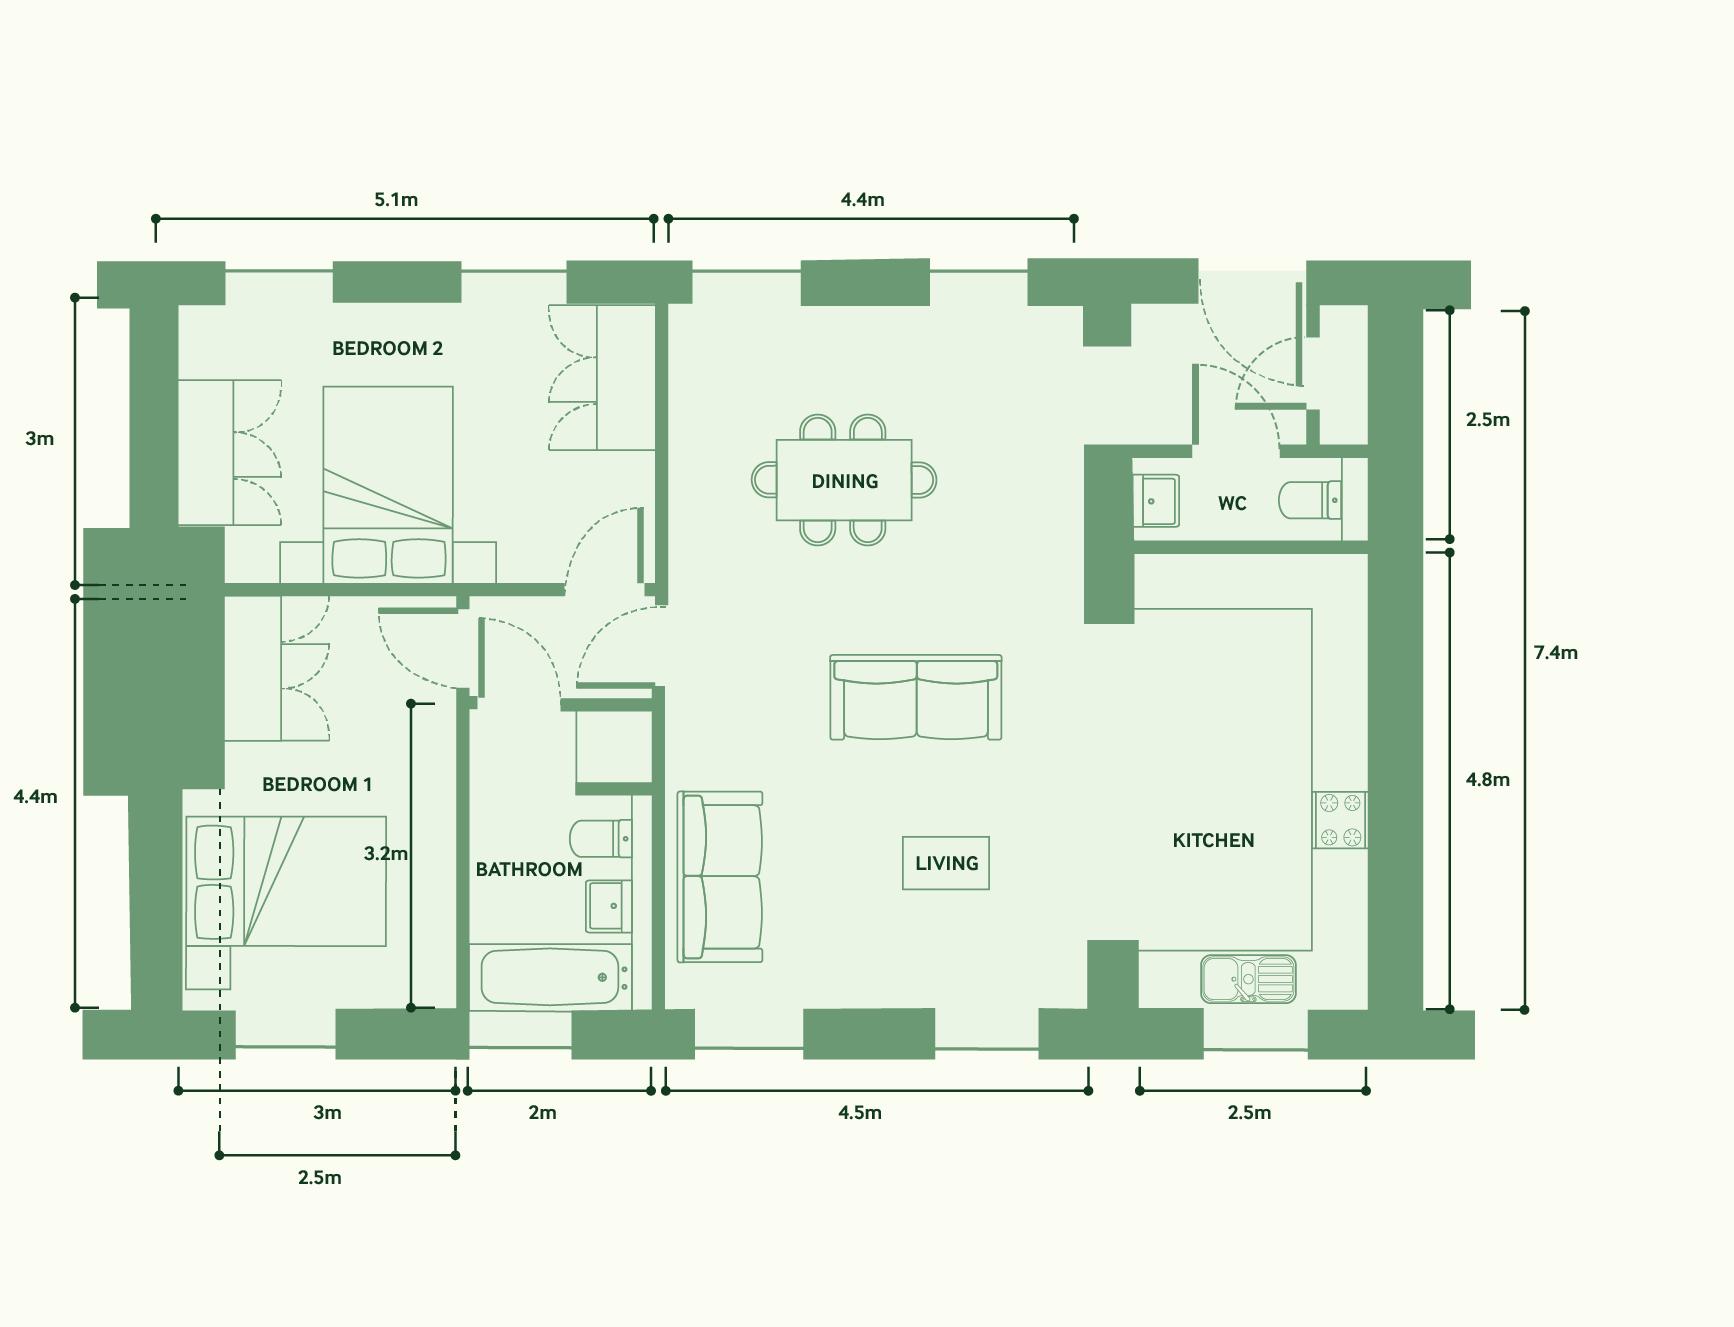 _Mundella-sfw-floorplan-export-apt-8-and-3.png